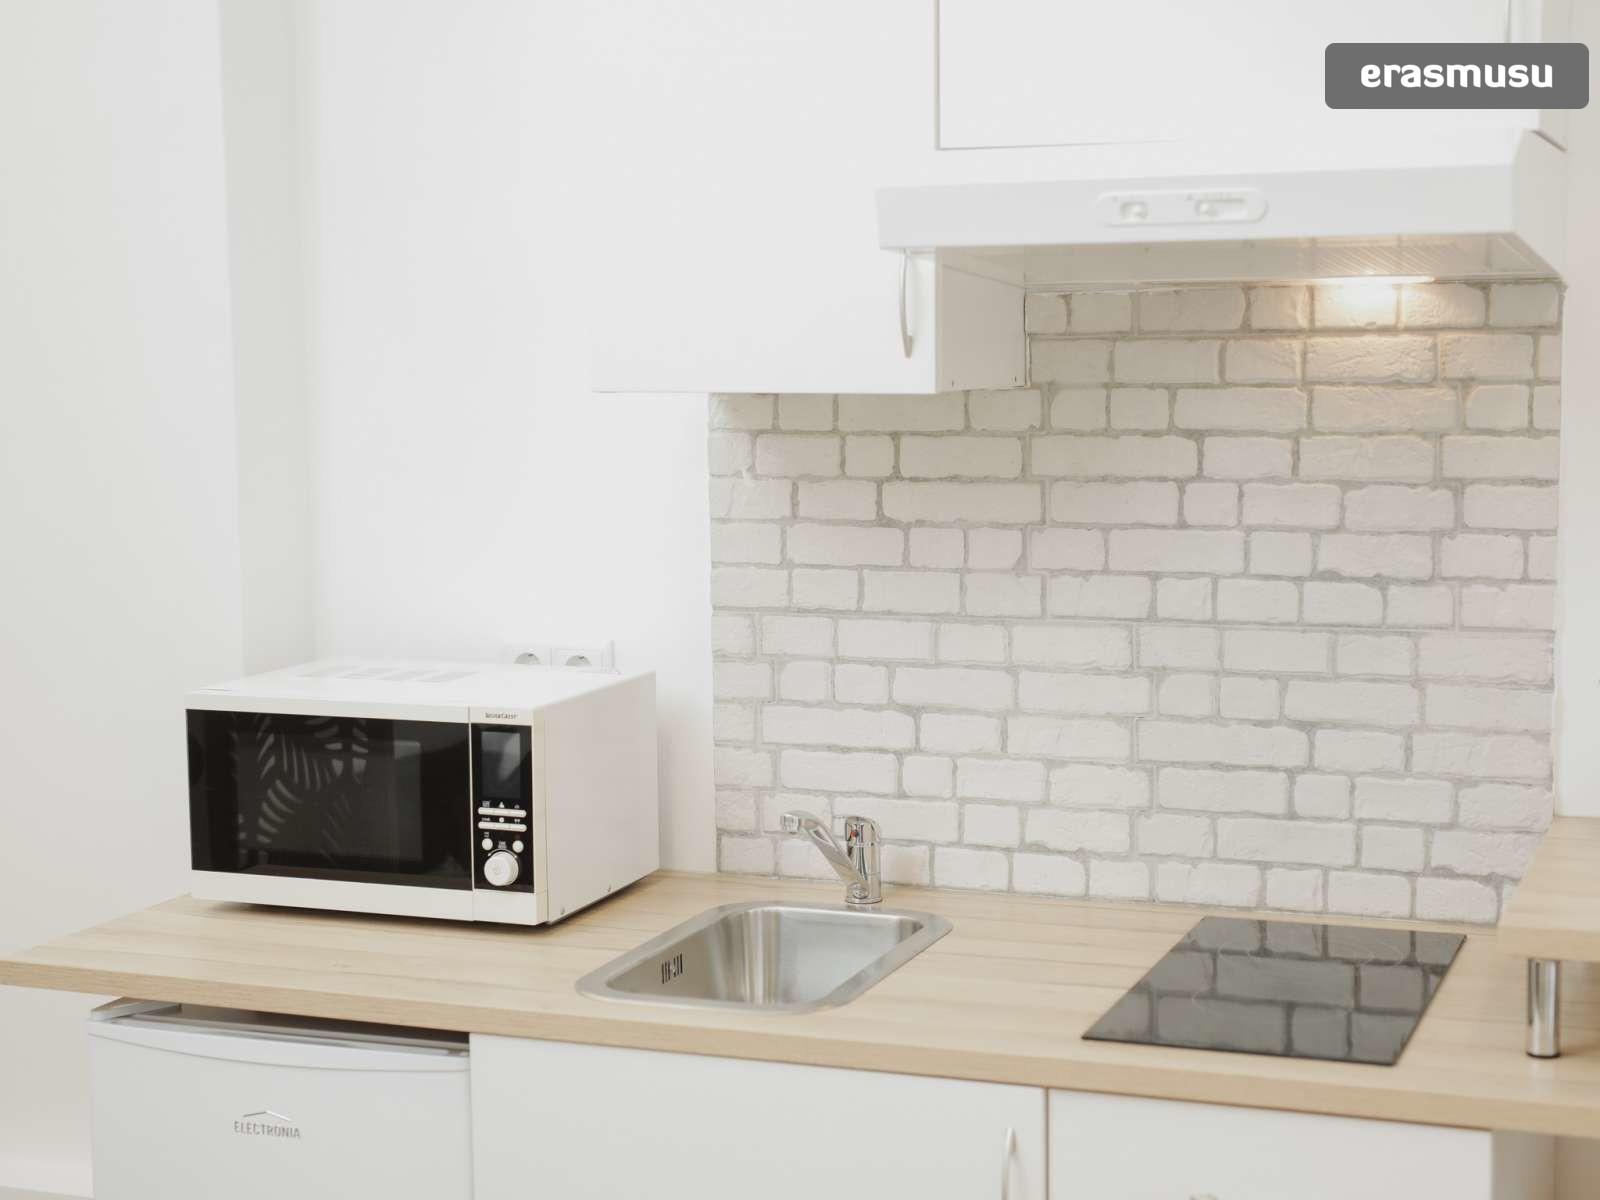 stunning-studio-apartment-rent-santo-ildefonso-6b75c74d6b2e97904